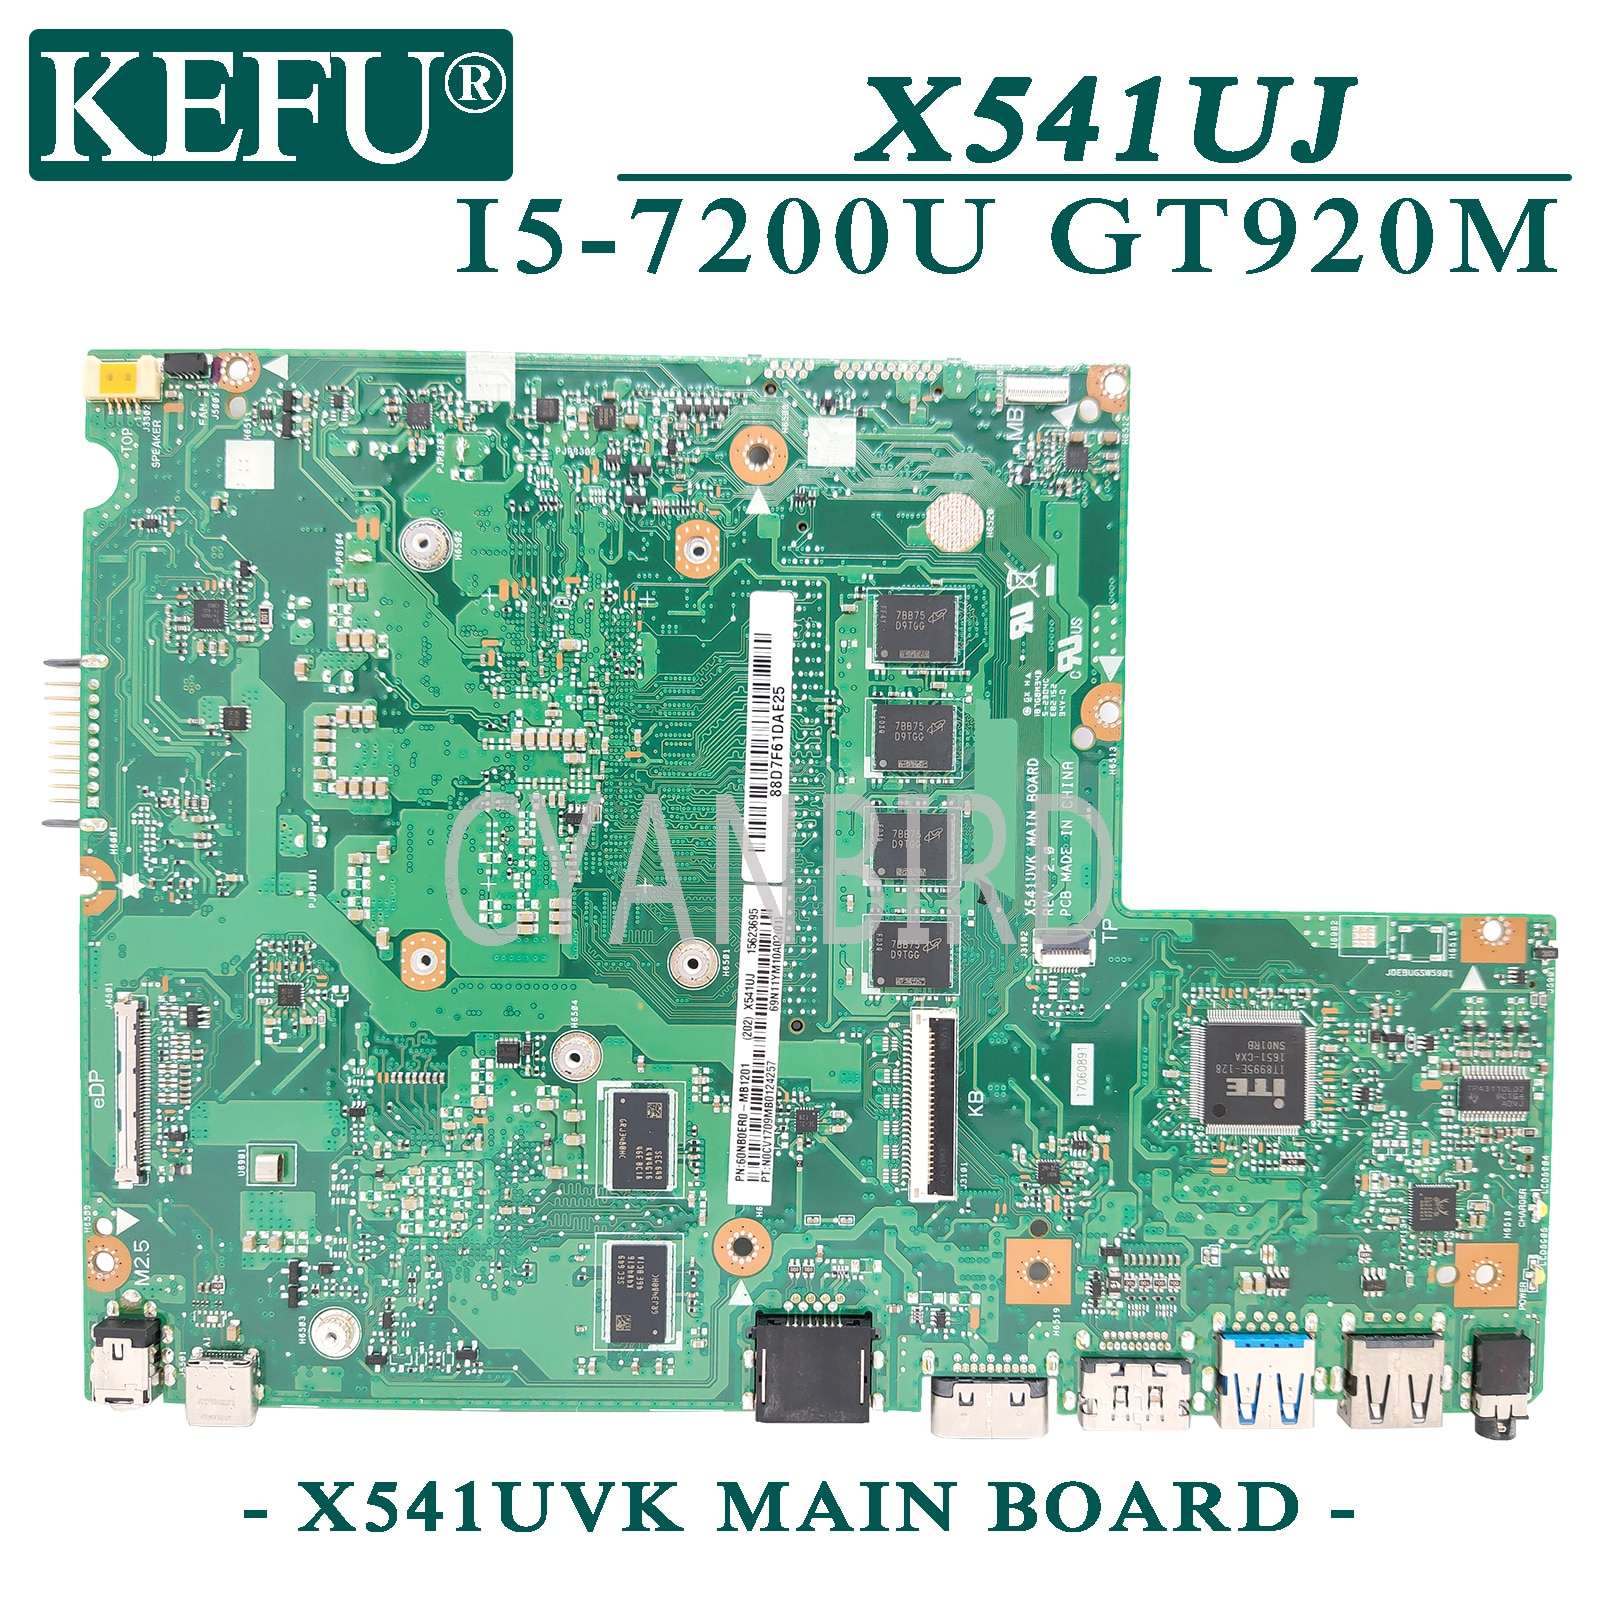 KEFU X541UVK اللوحة الرئيسية الأصلية ل ASUS X541UJ X541UV X541U مع 4GB-RAM I5-7200U GT920M اللوحة الأم للكمبيوتر المحمول